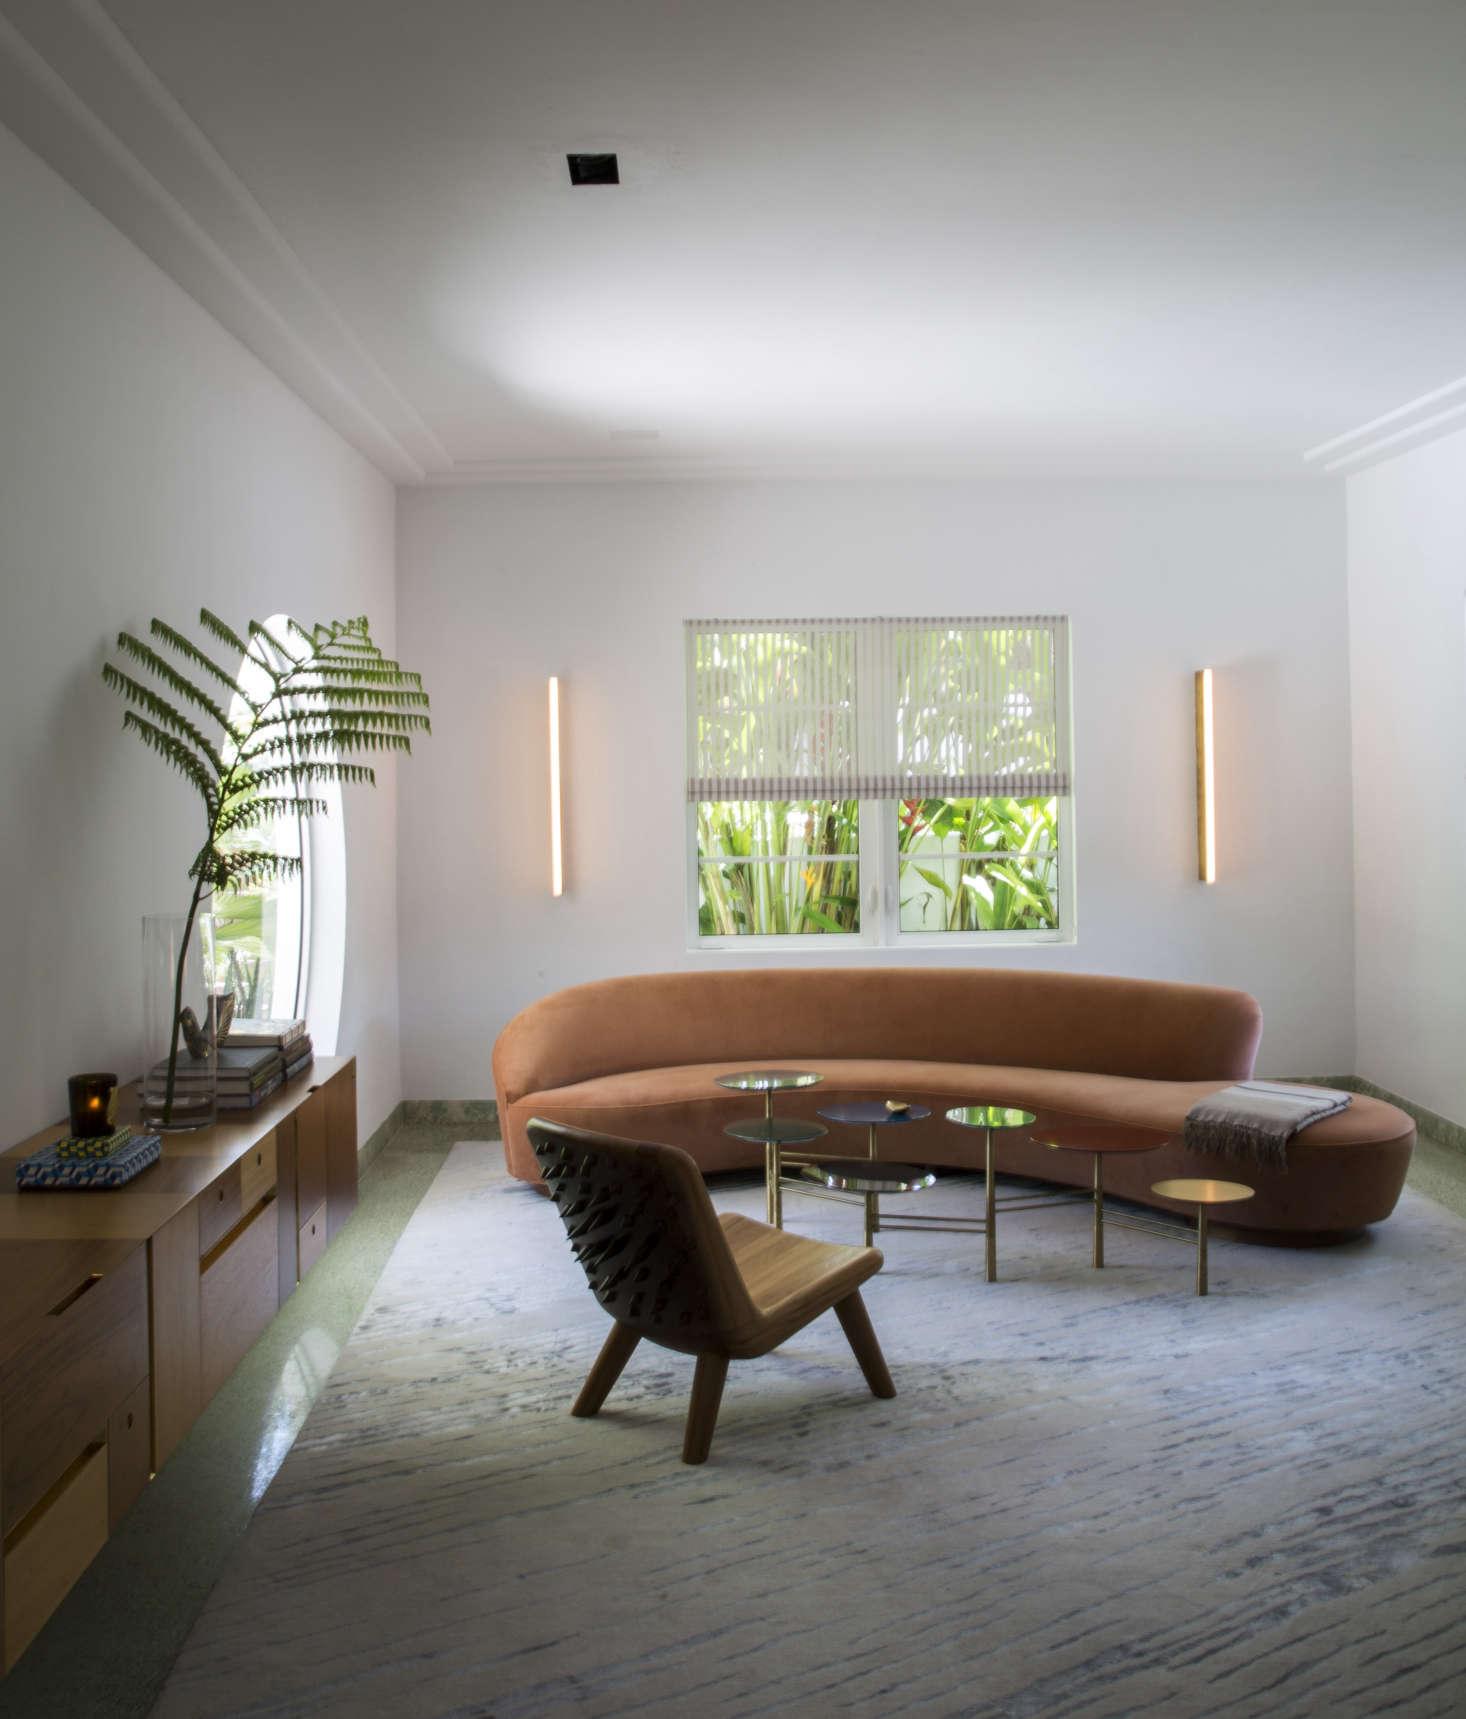 Good Living room with Vladimir Kagan sofa in Miami art deco villa remodel by Stephan Weishaupt